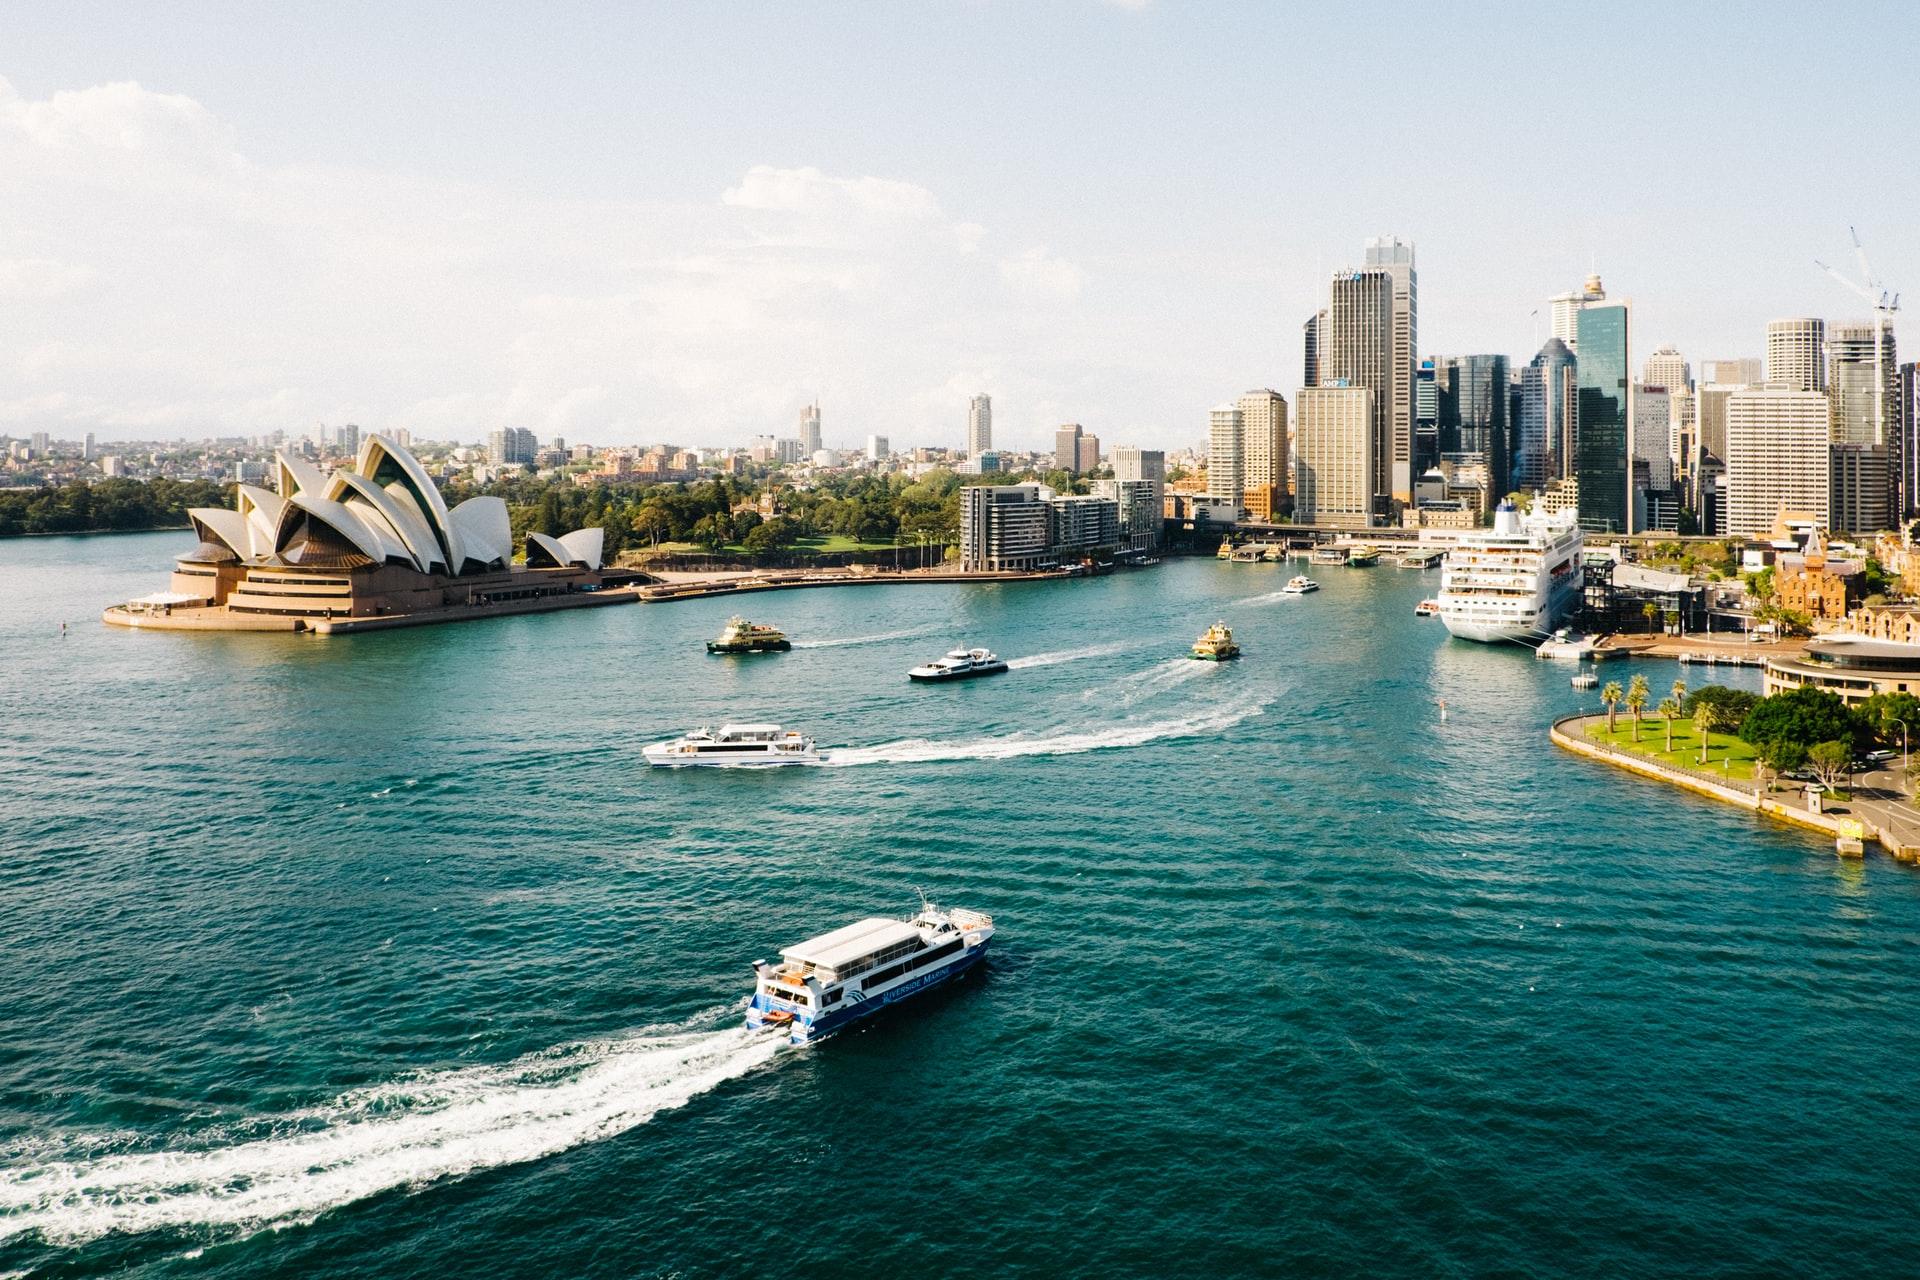 The Australian skyline. Photo by Dan Freeman on Unsplash.